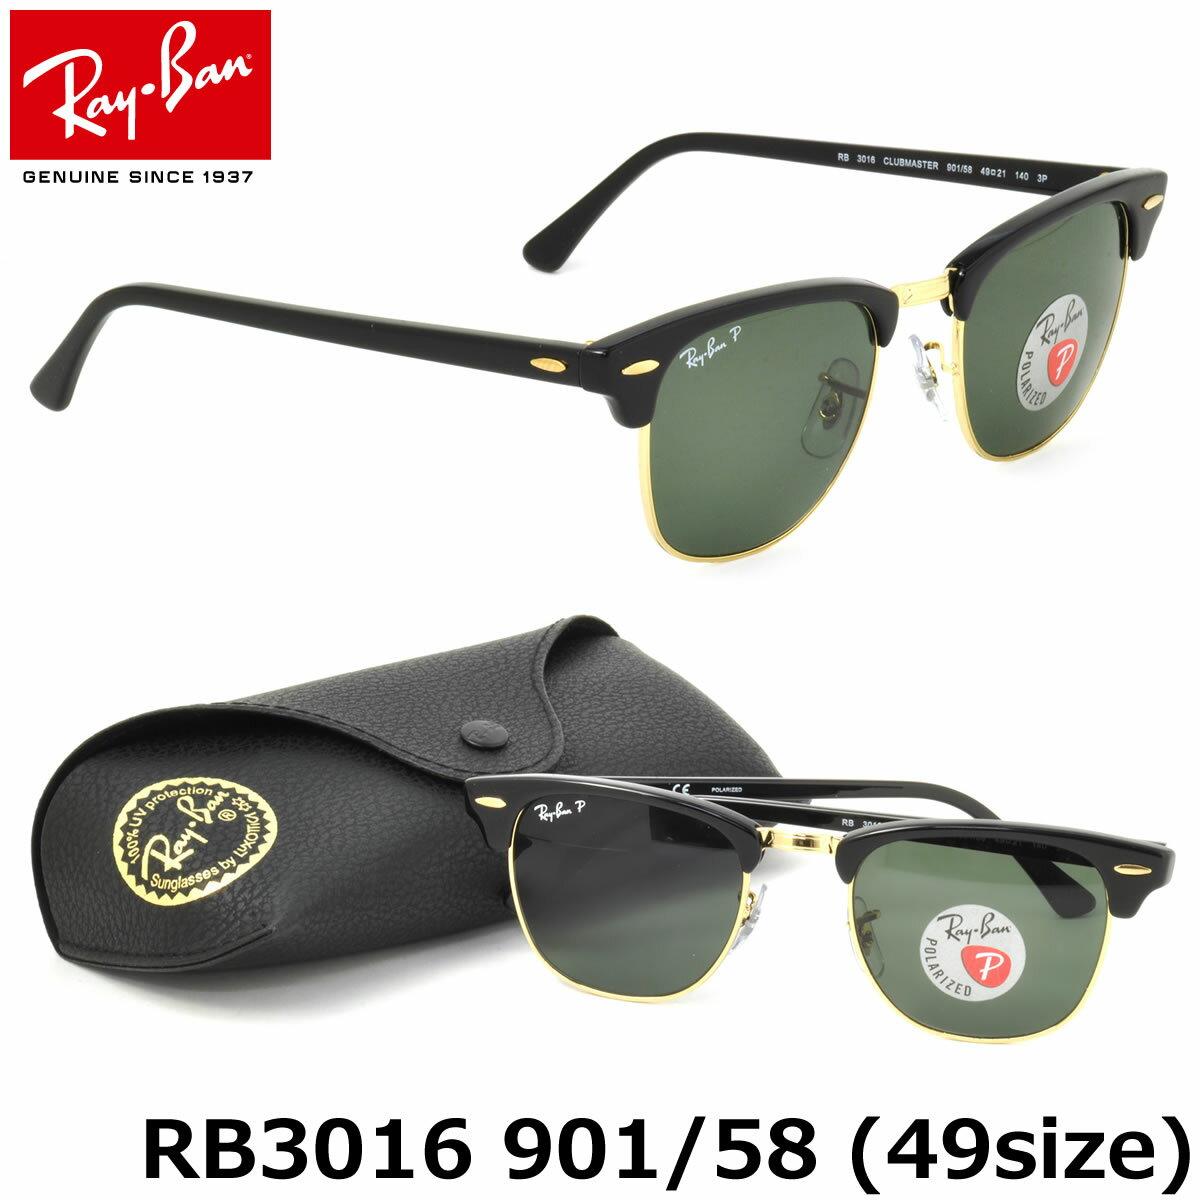 Ray Ban 3016 Clubmaster 901   Louisiana Bucket Brigade 0997f8d74c